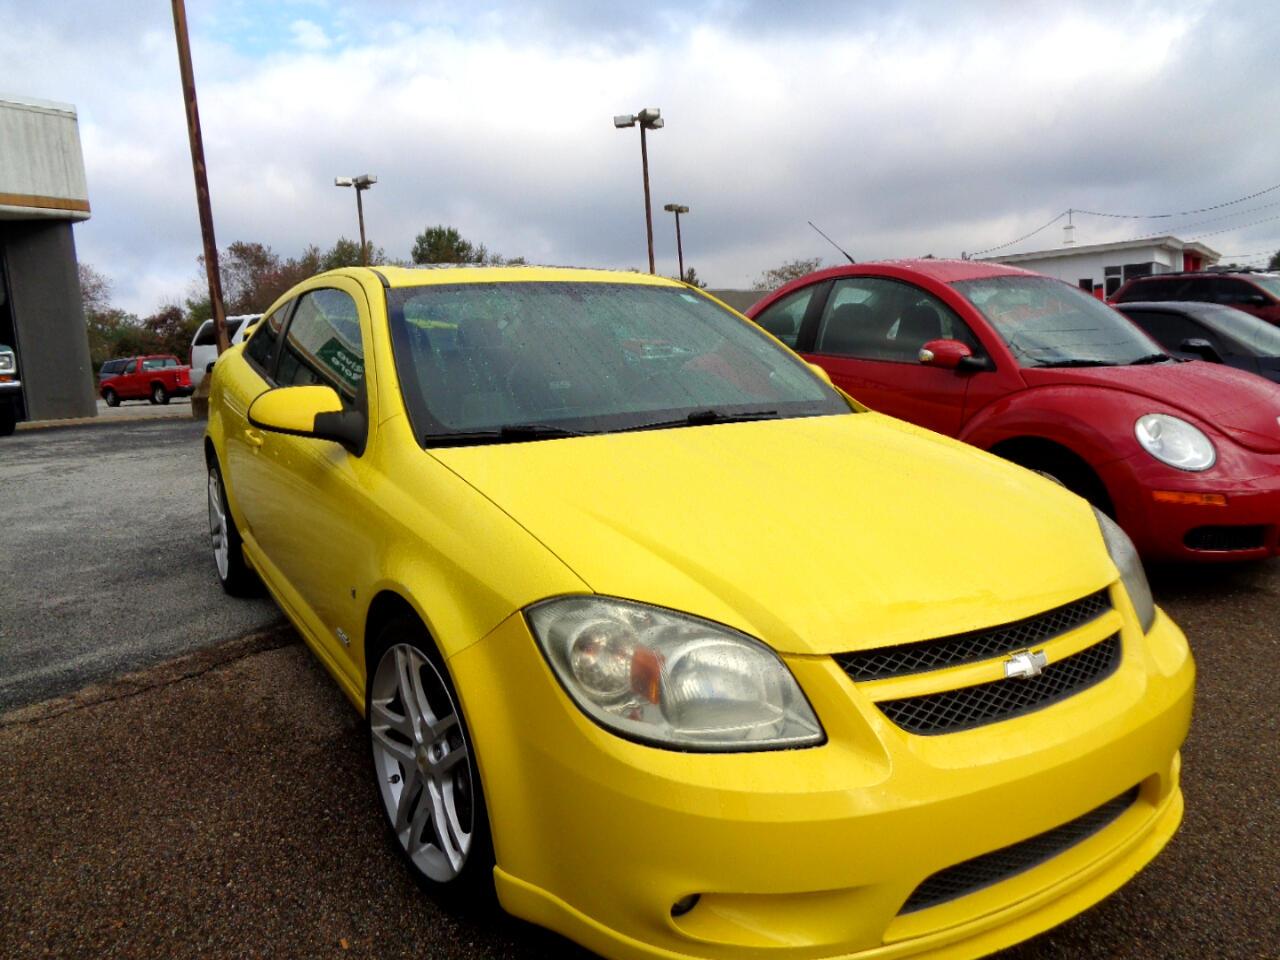 2008 Chevrolet Cobalt 2dr Cpe SS